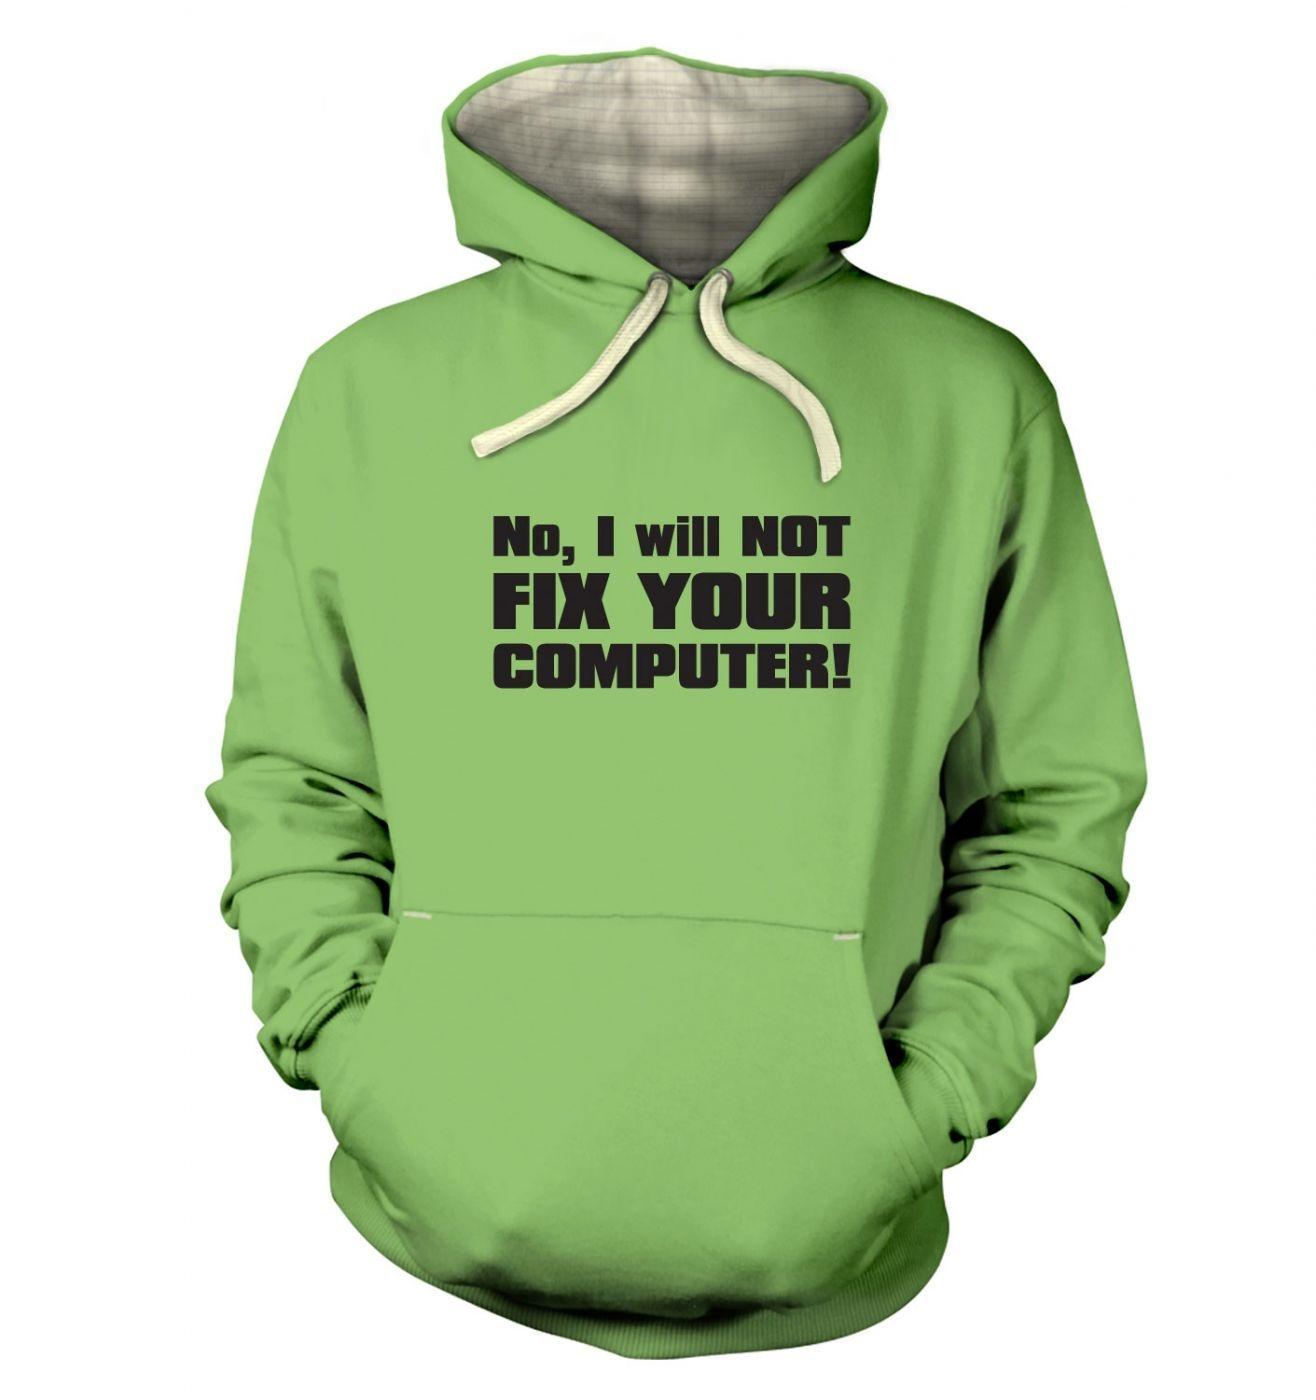 I Will NOT Fix Your Computer premium hoodie